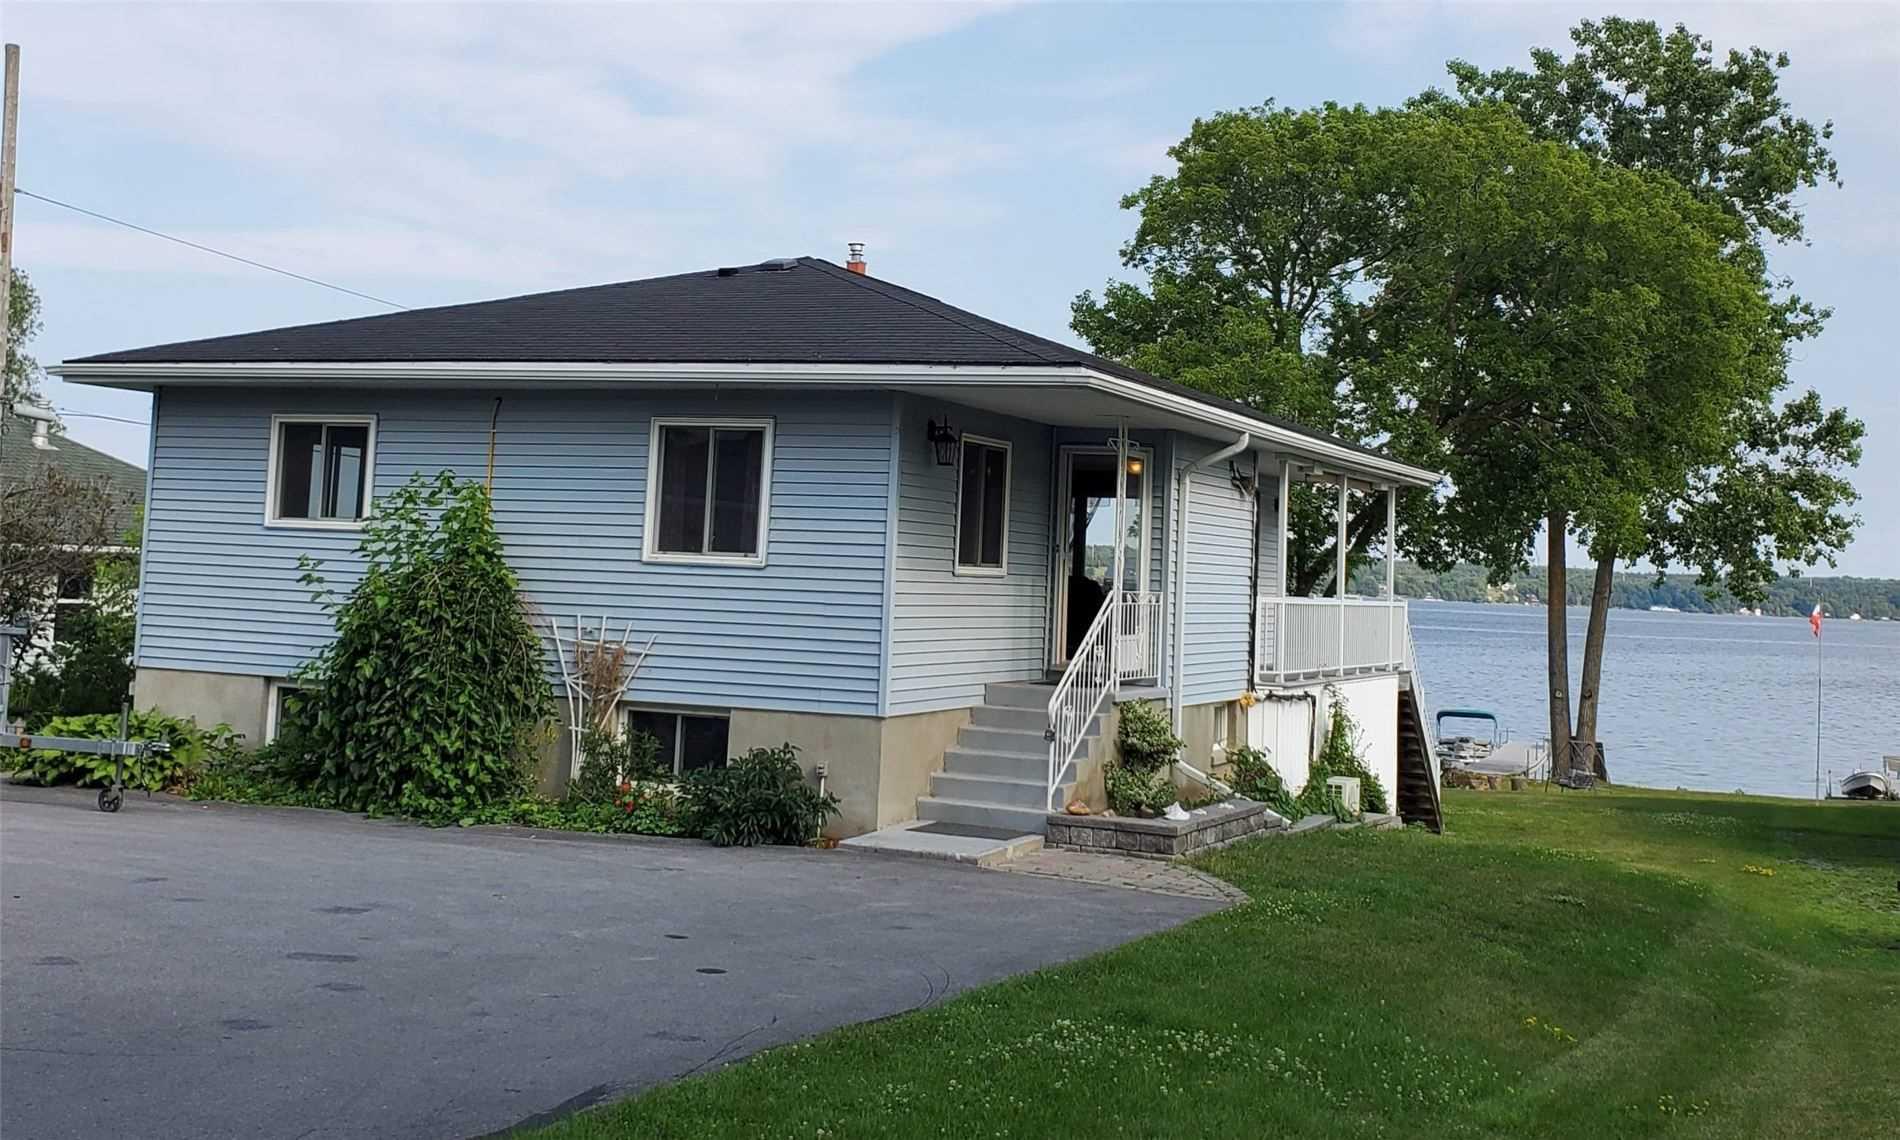 Detached house For Sale In Deseronto - 52 Main St, Deseronto, Ontario, Canada K0K 1X0 , 2 Bedrooms Bedrooms, ,2 BathroomsBathrooms,Detached,For Sale,Main